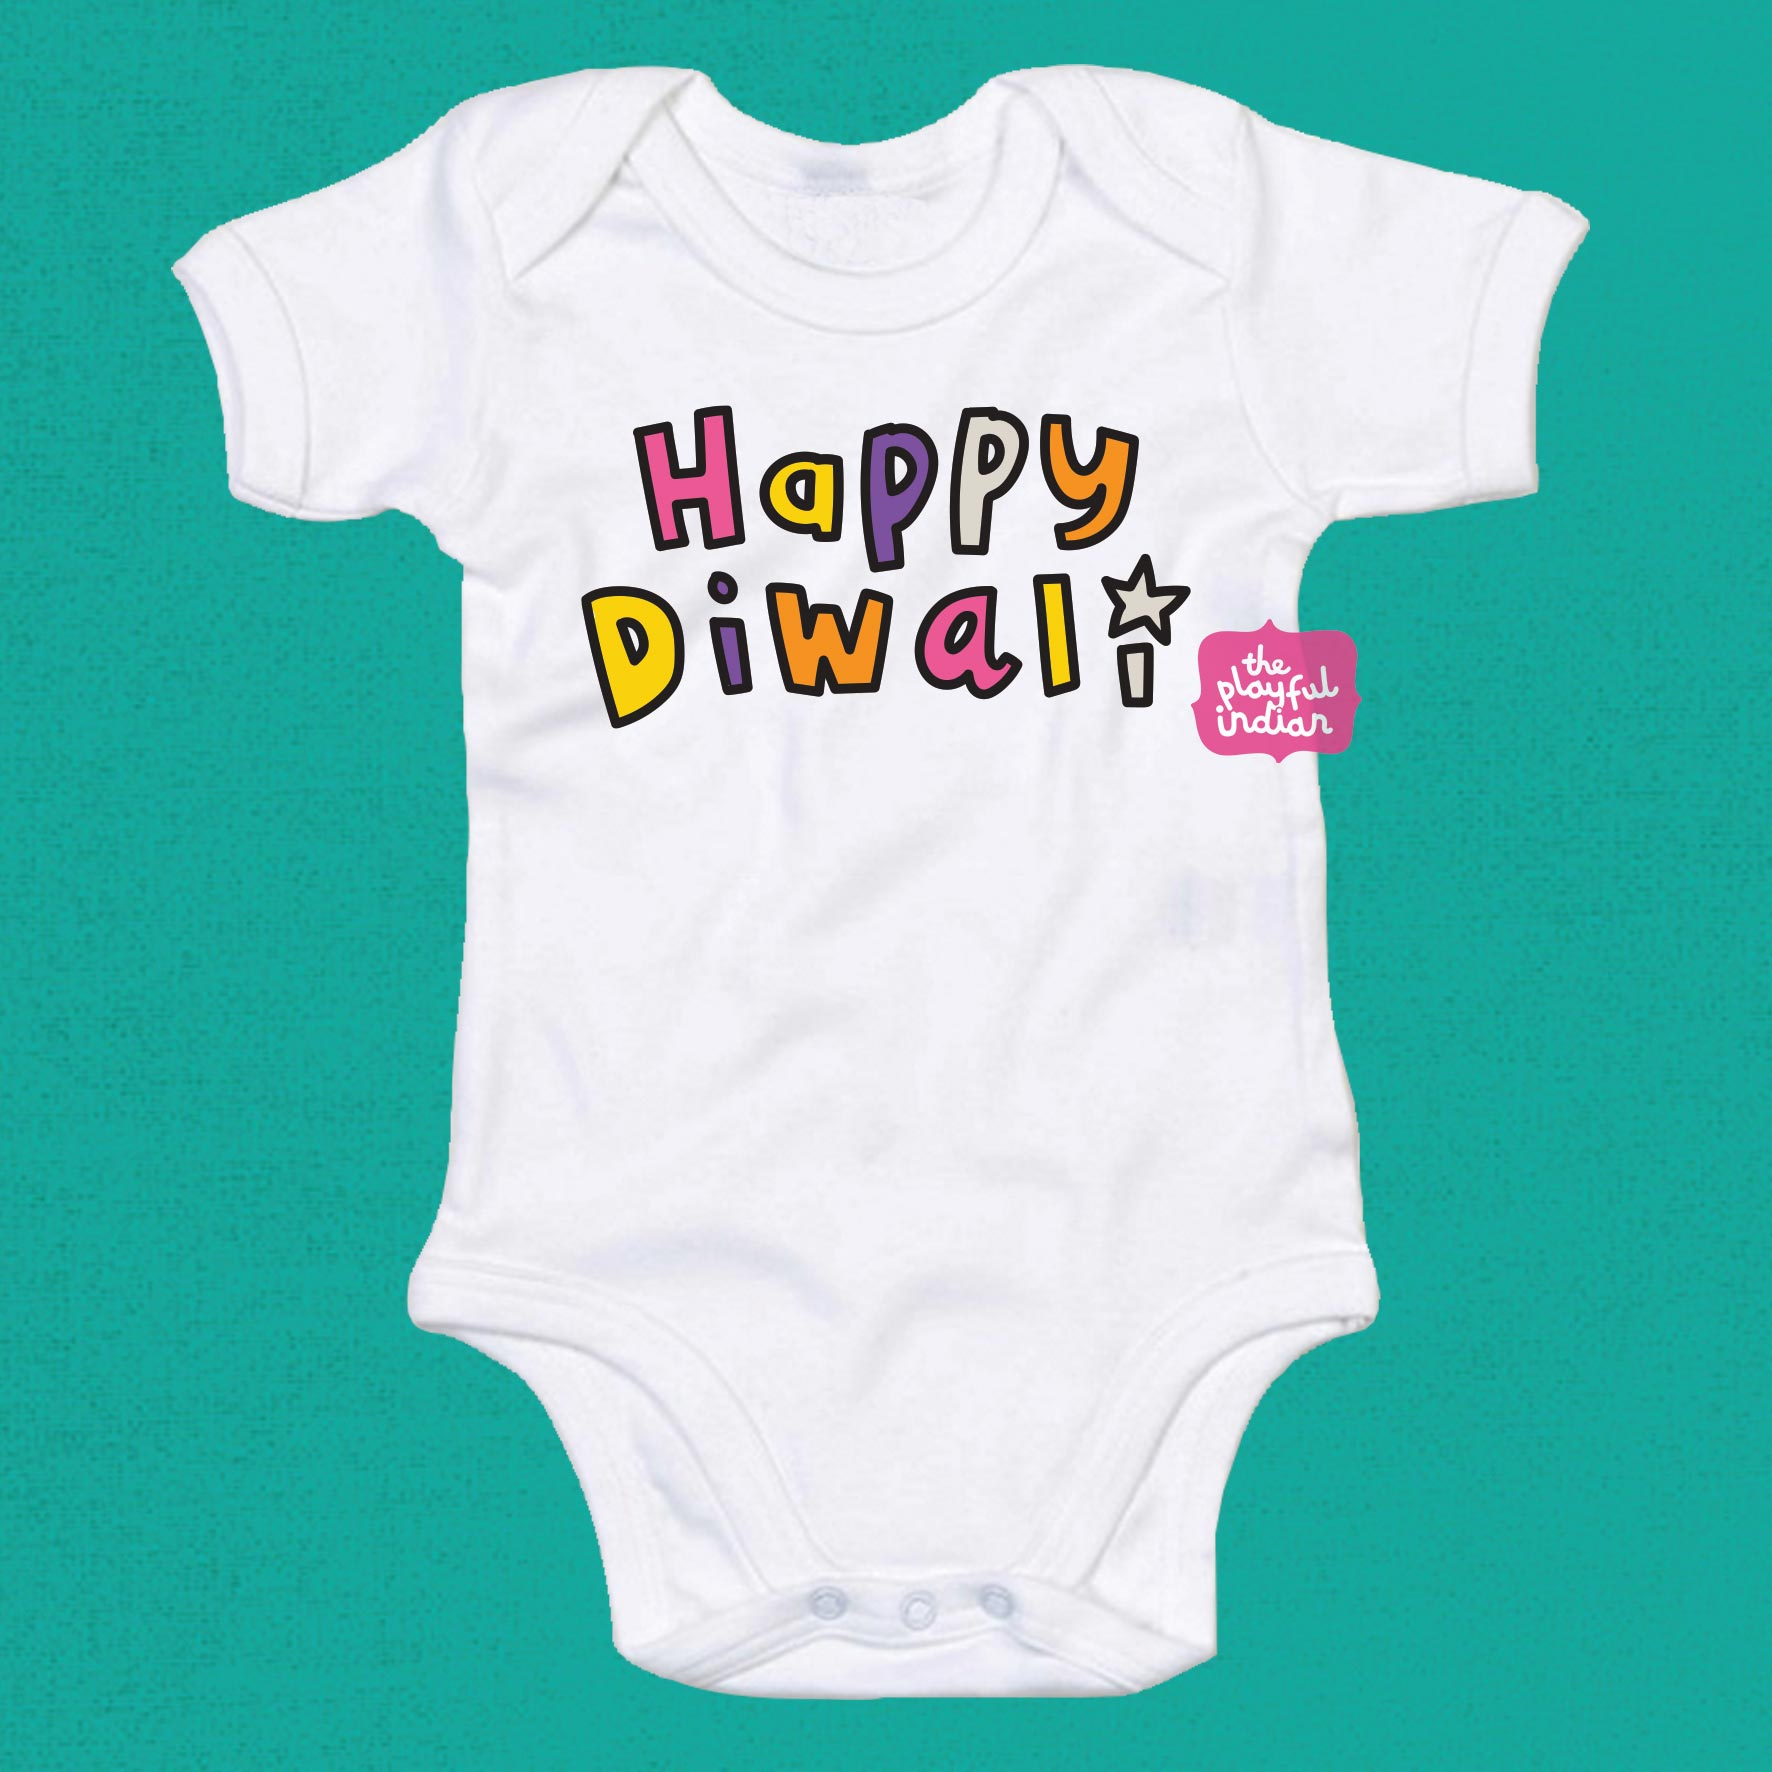 Diwali babygrow